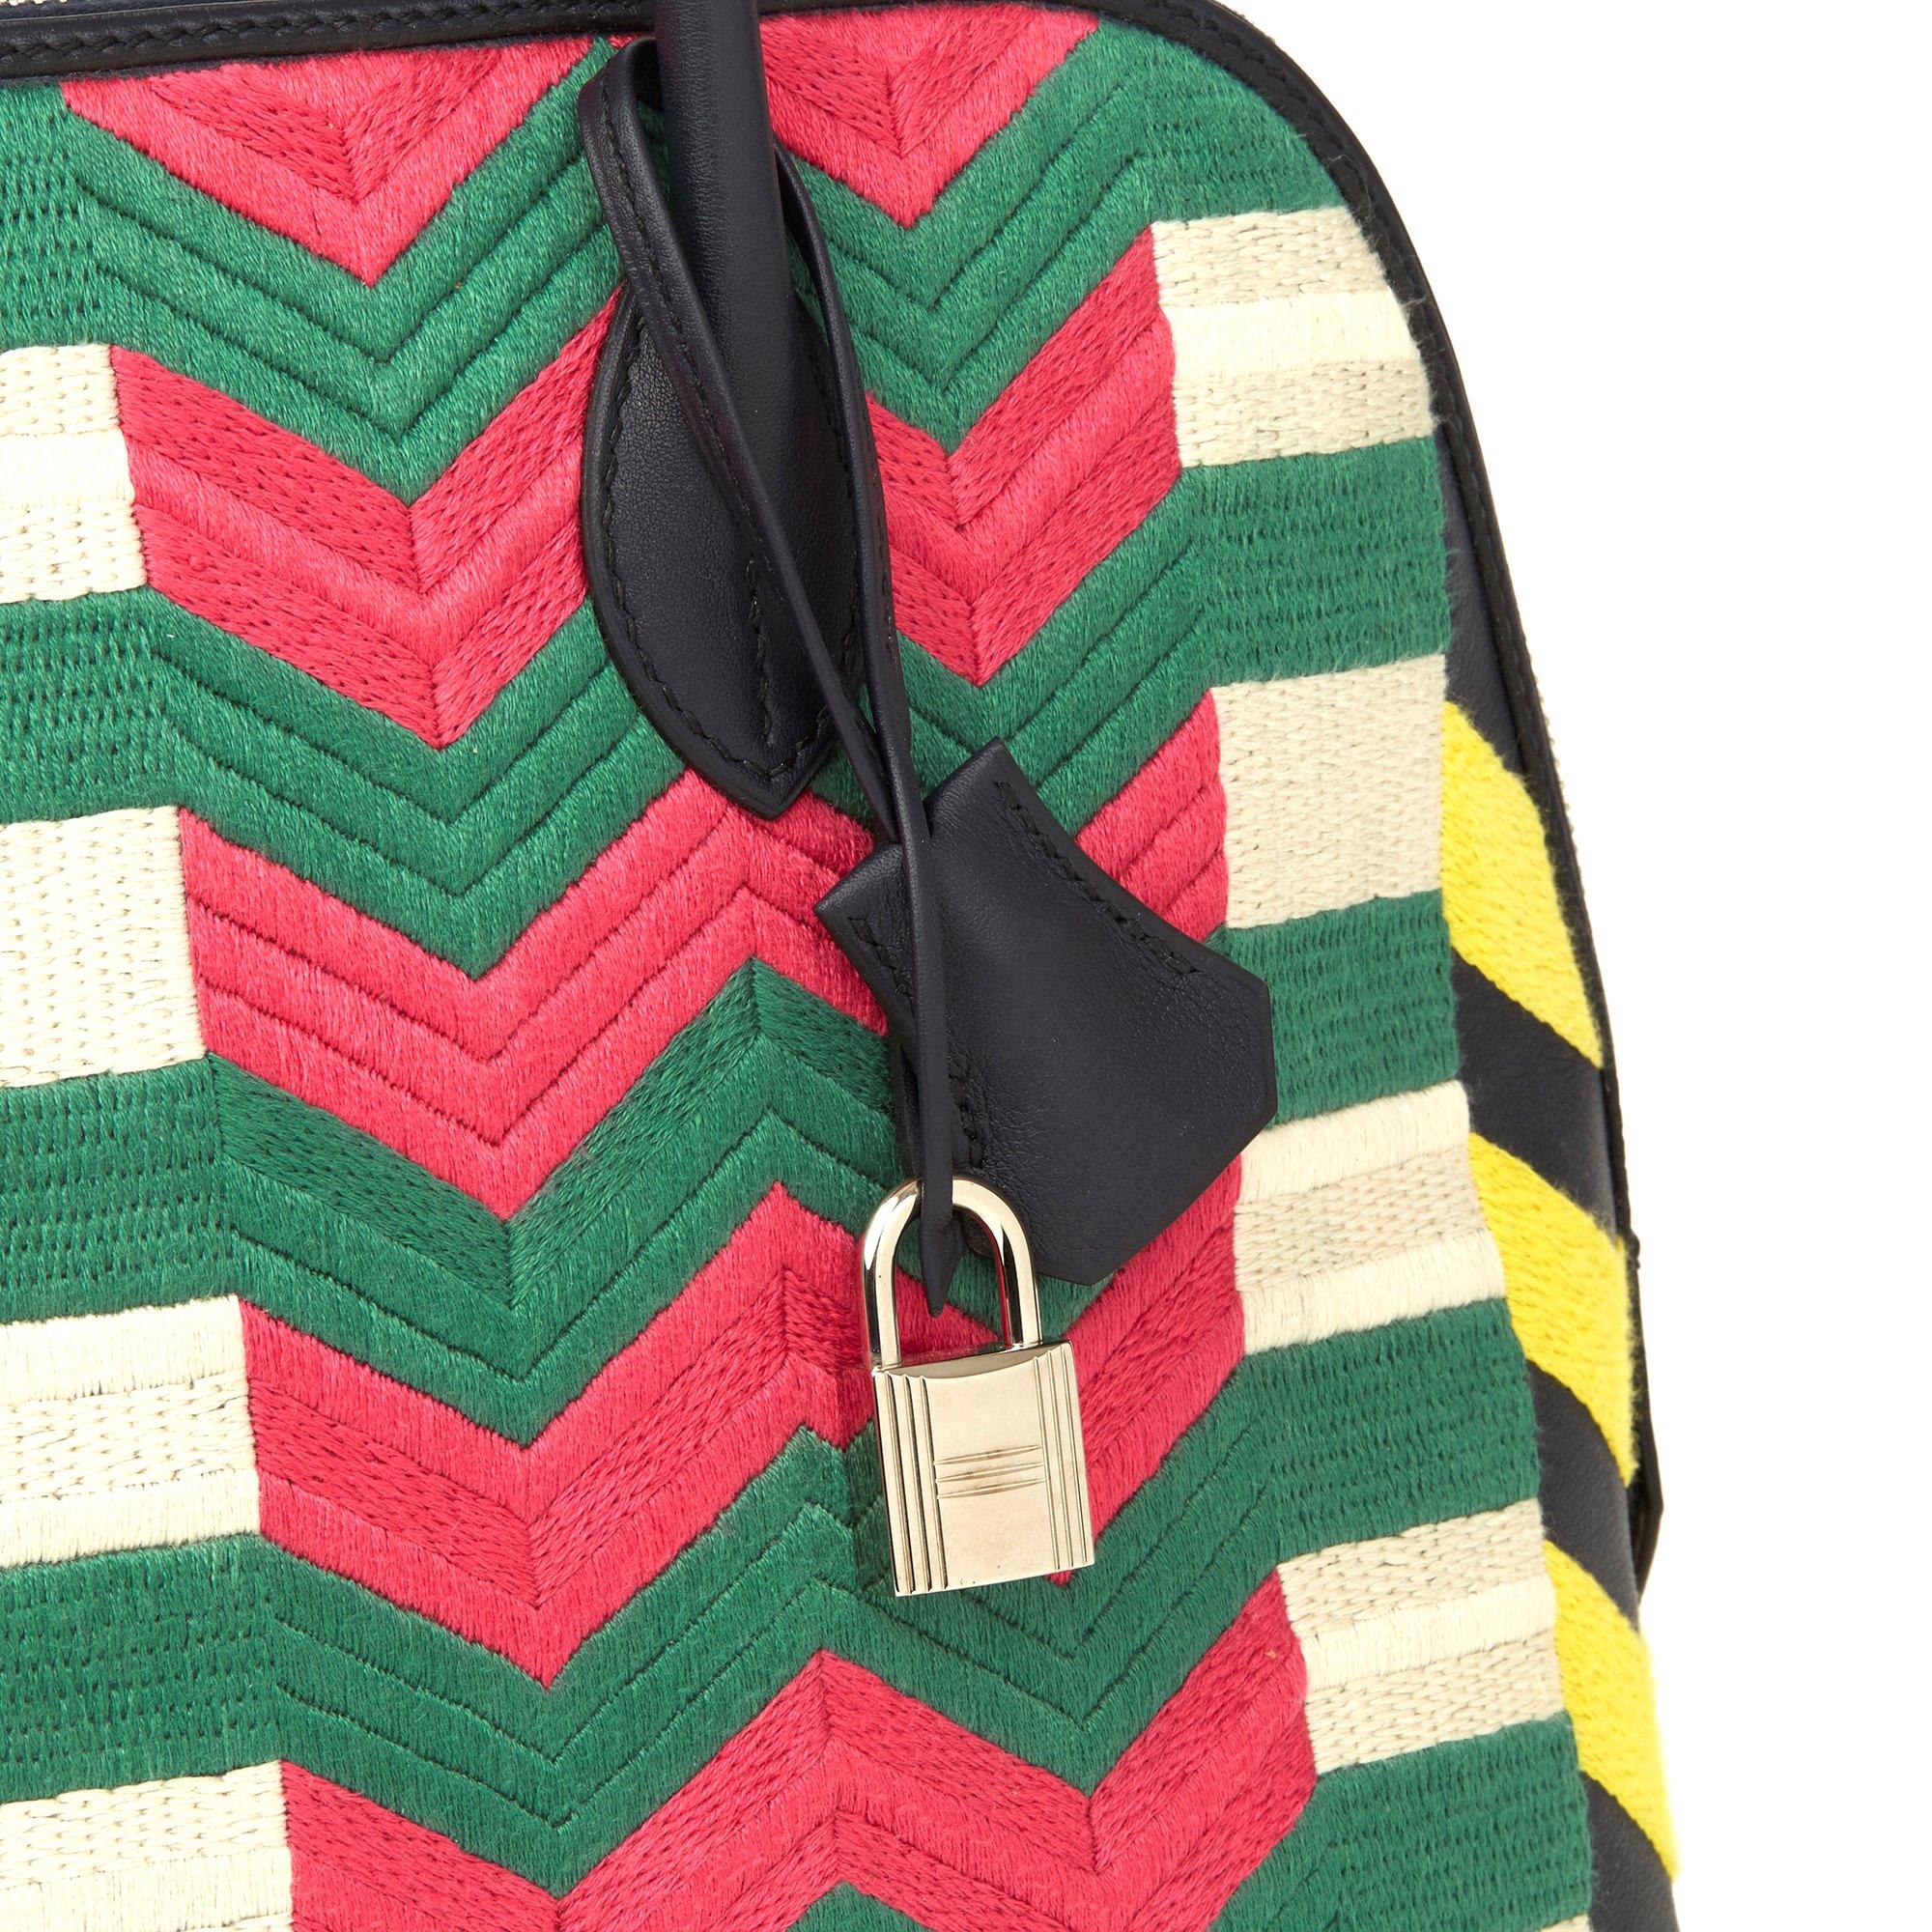 Hermès Indigo Multicolour Embroidered Swift Leather Zig Zag Bolide 1923 30cm